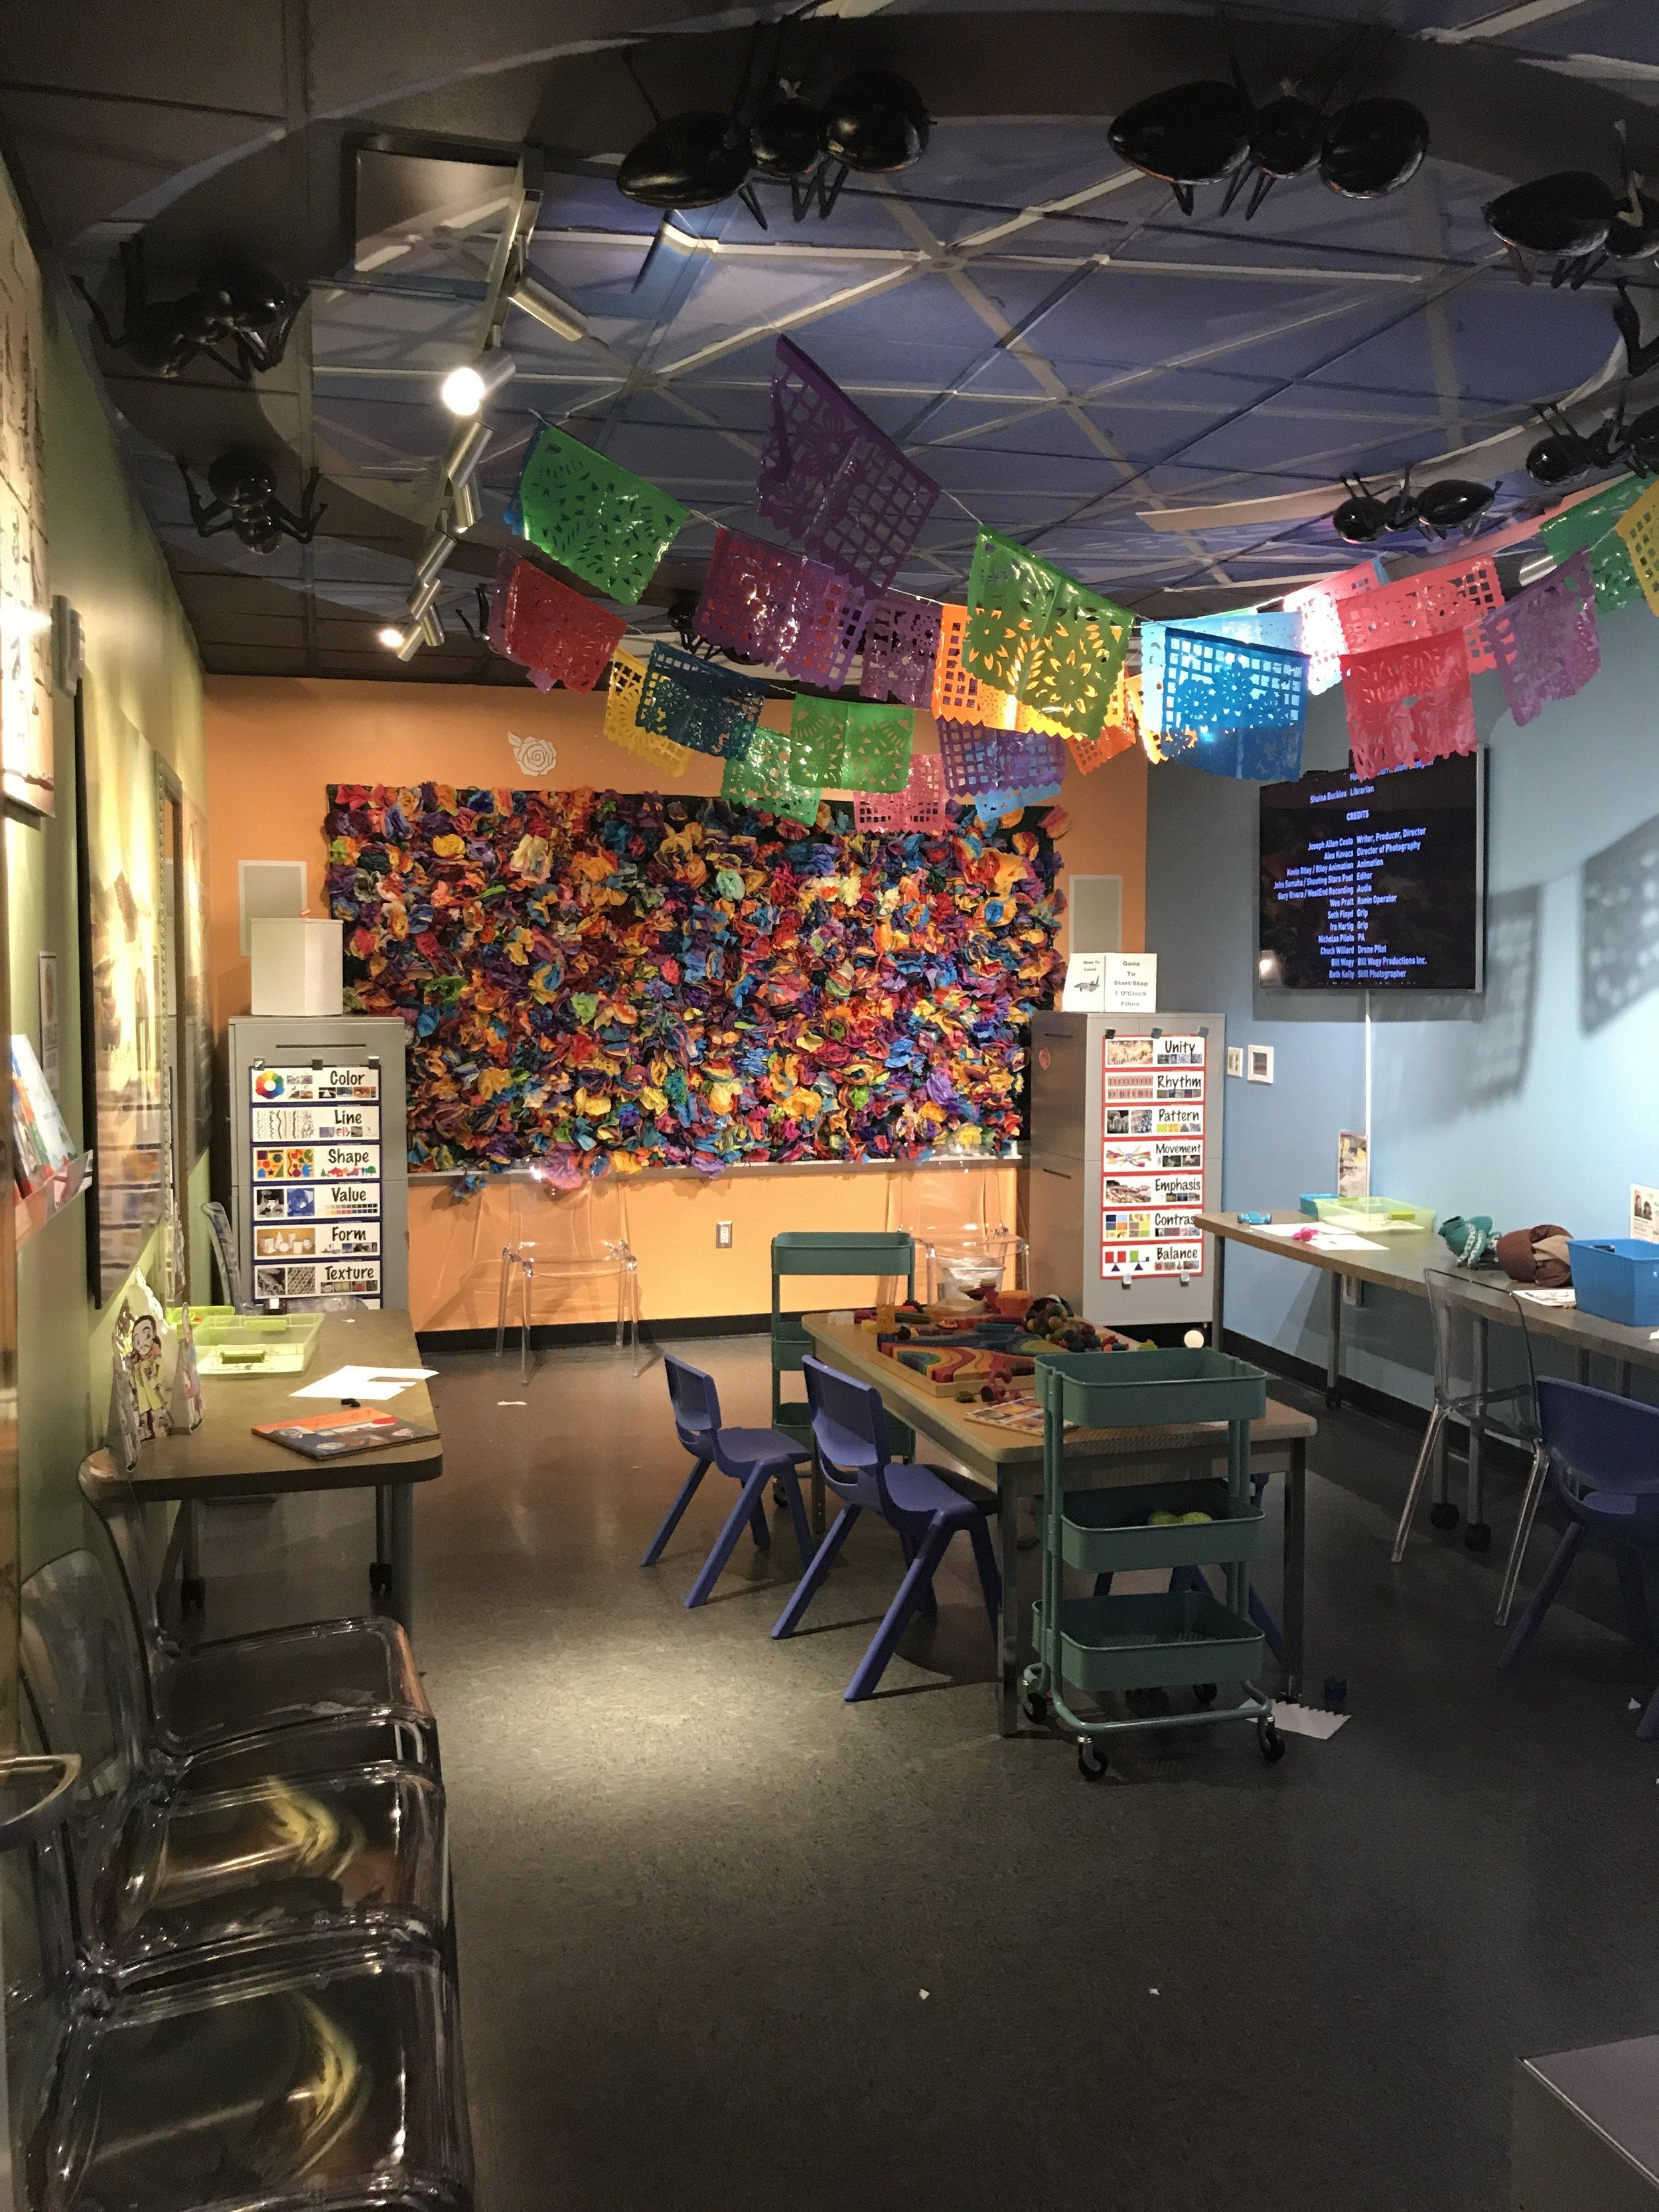 salvador dali museum st petersburg review art surrealism